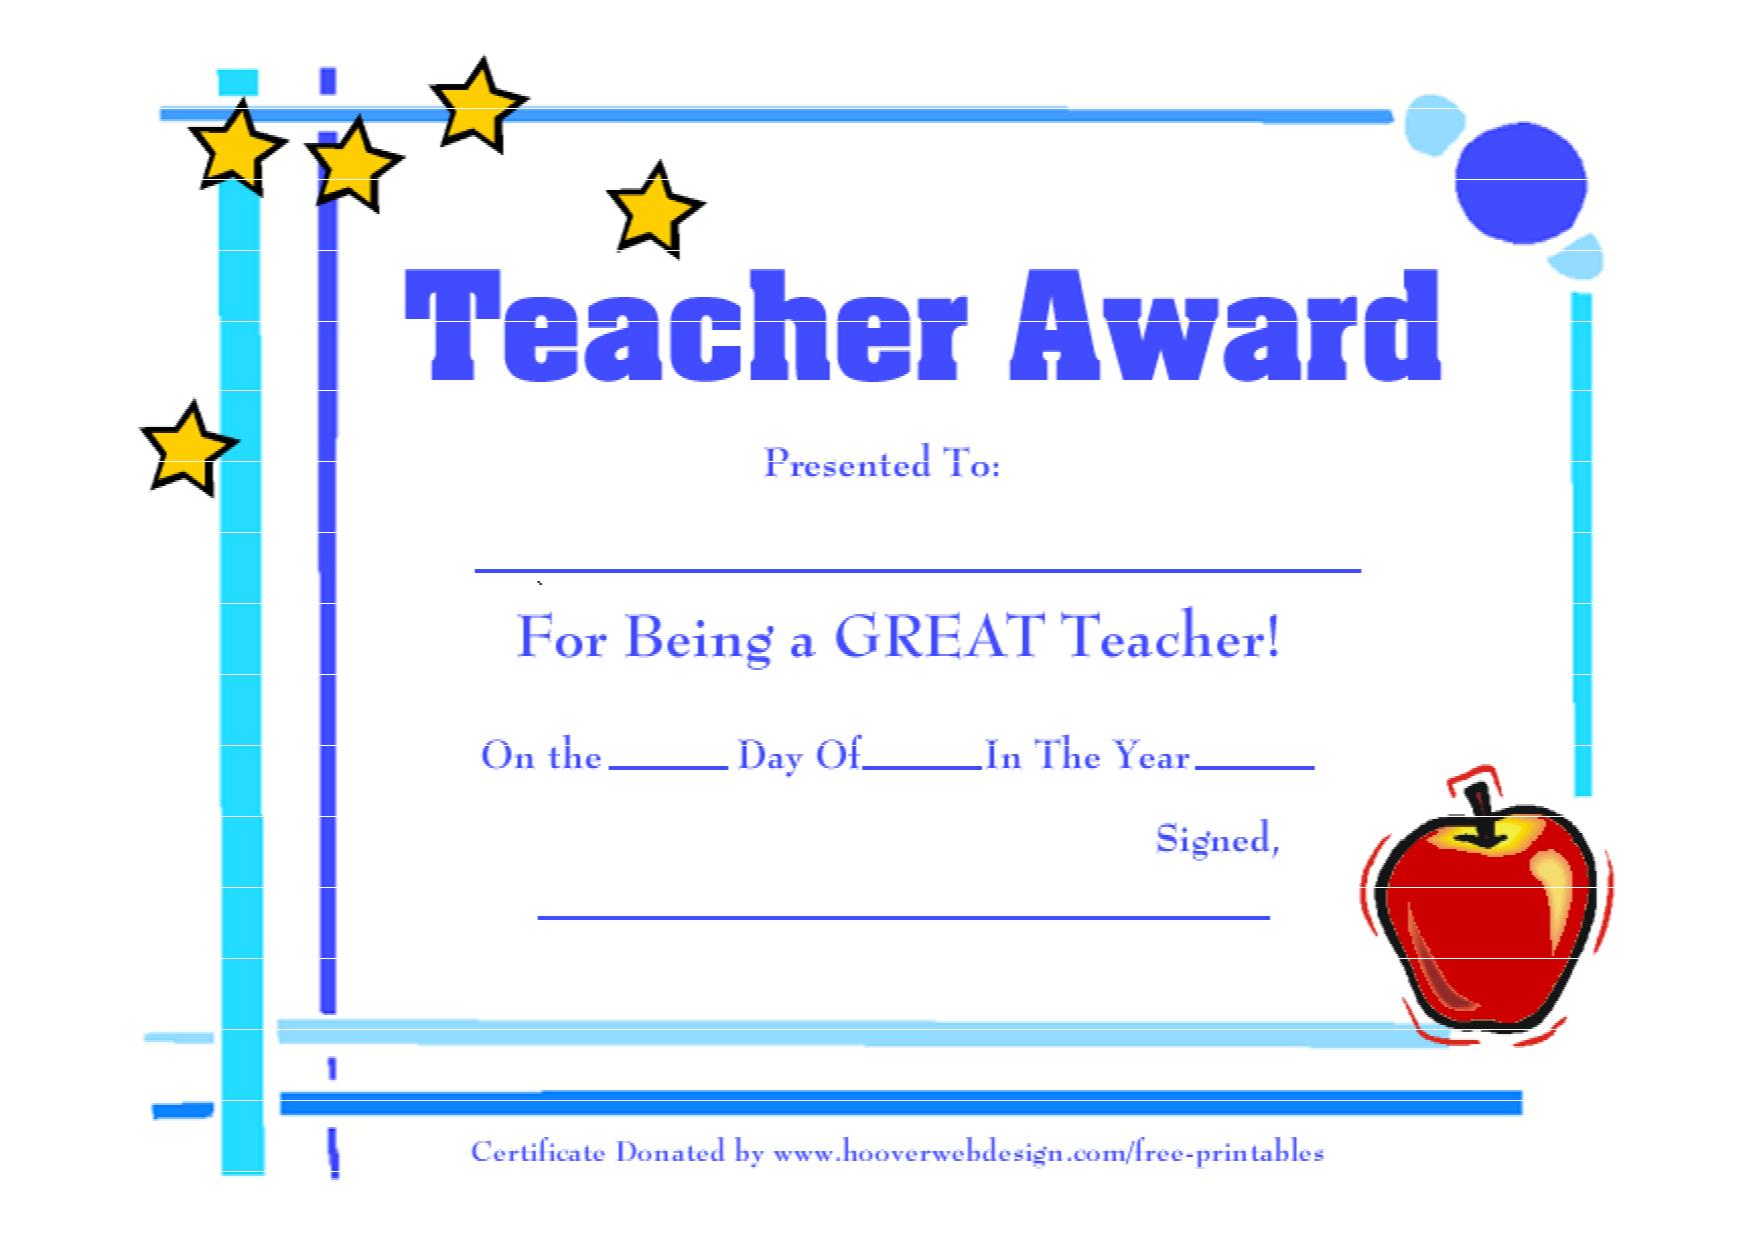 Teacher-Awards-9 New Certificat Templates - Free Printable Certificates For Teachers